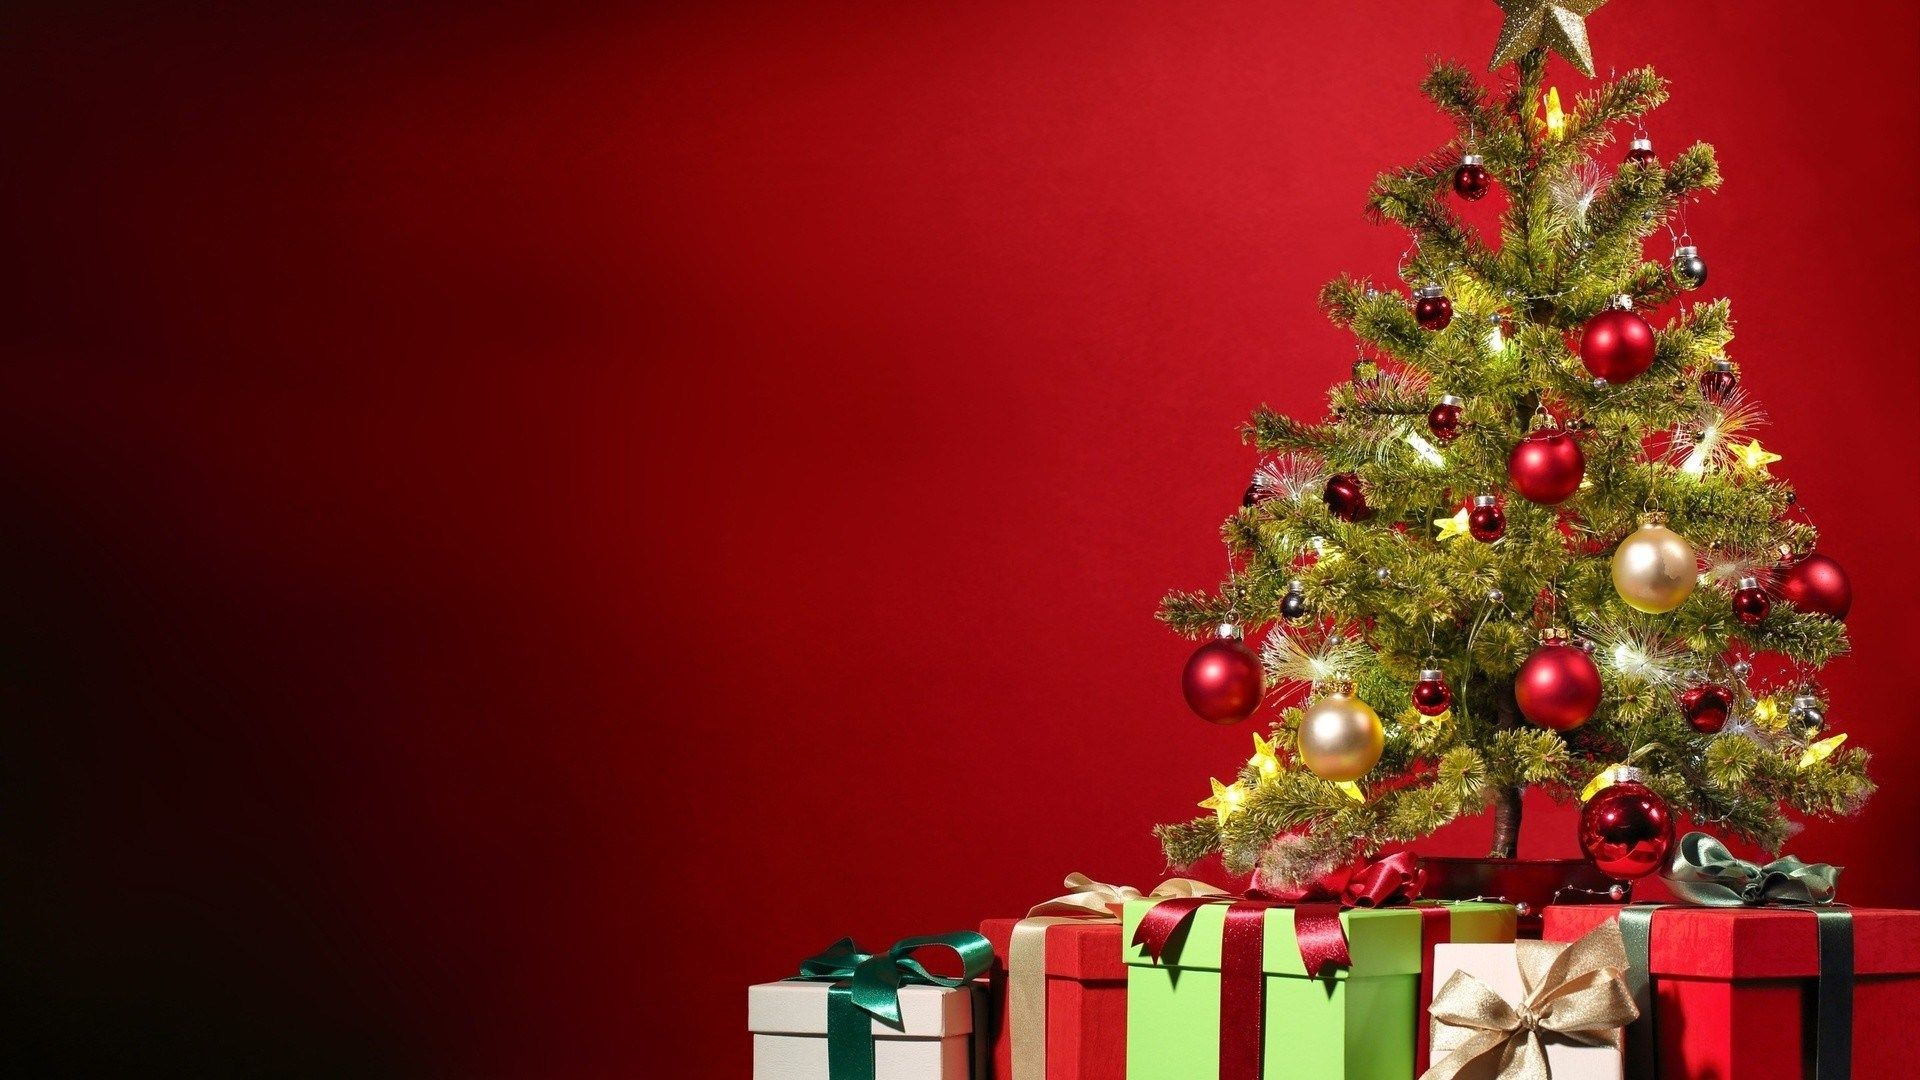 Download Merry Christmas Wallpapers #18466 Wallpaper | ololoshka ...